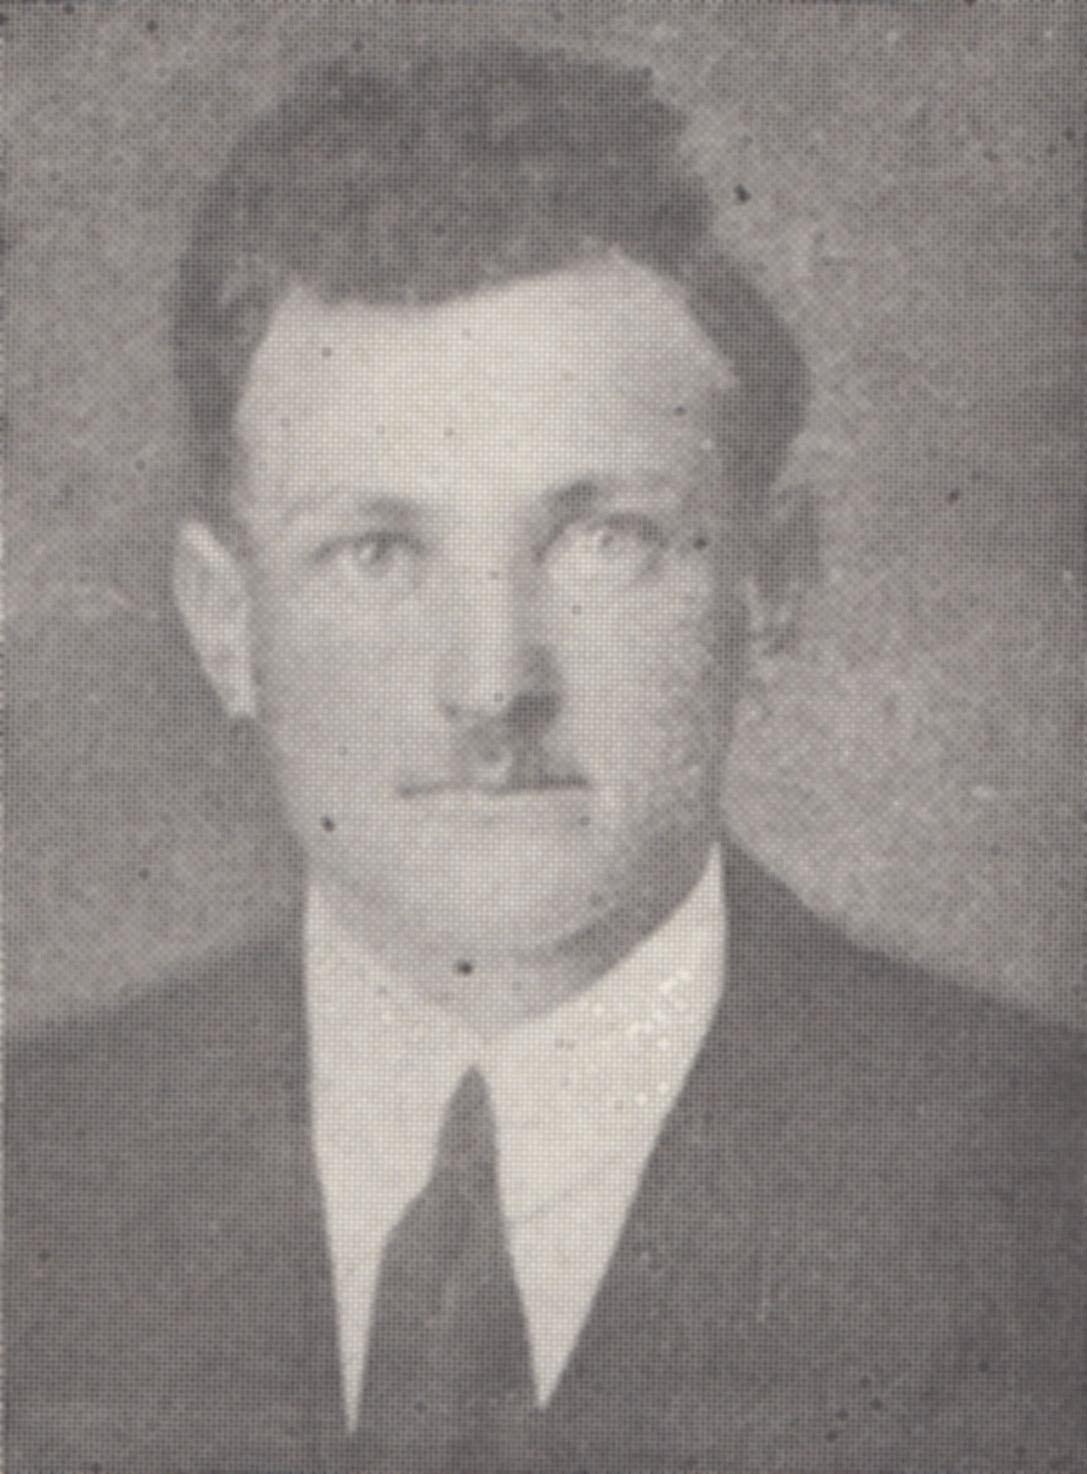 Johann Rohner-Loher (1904-1962)